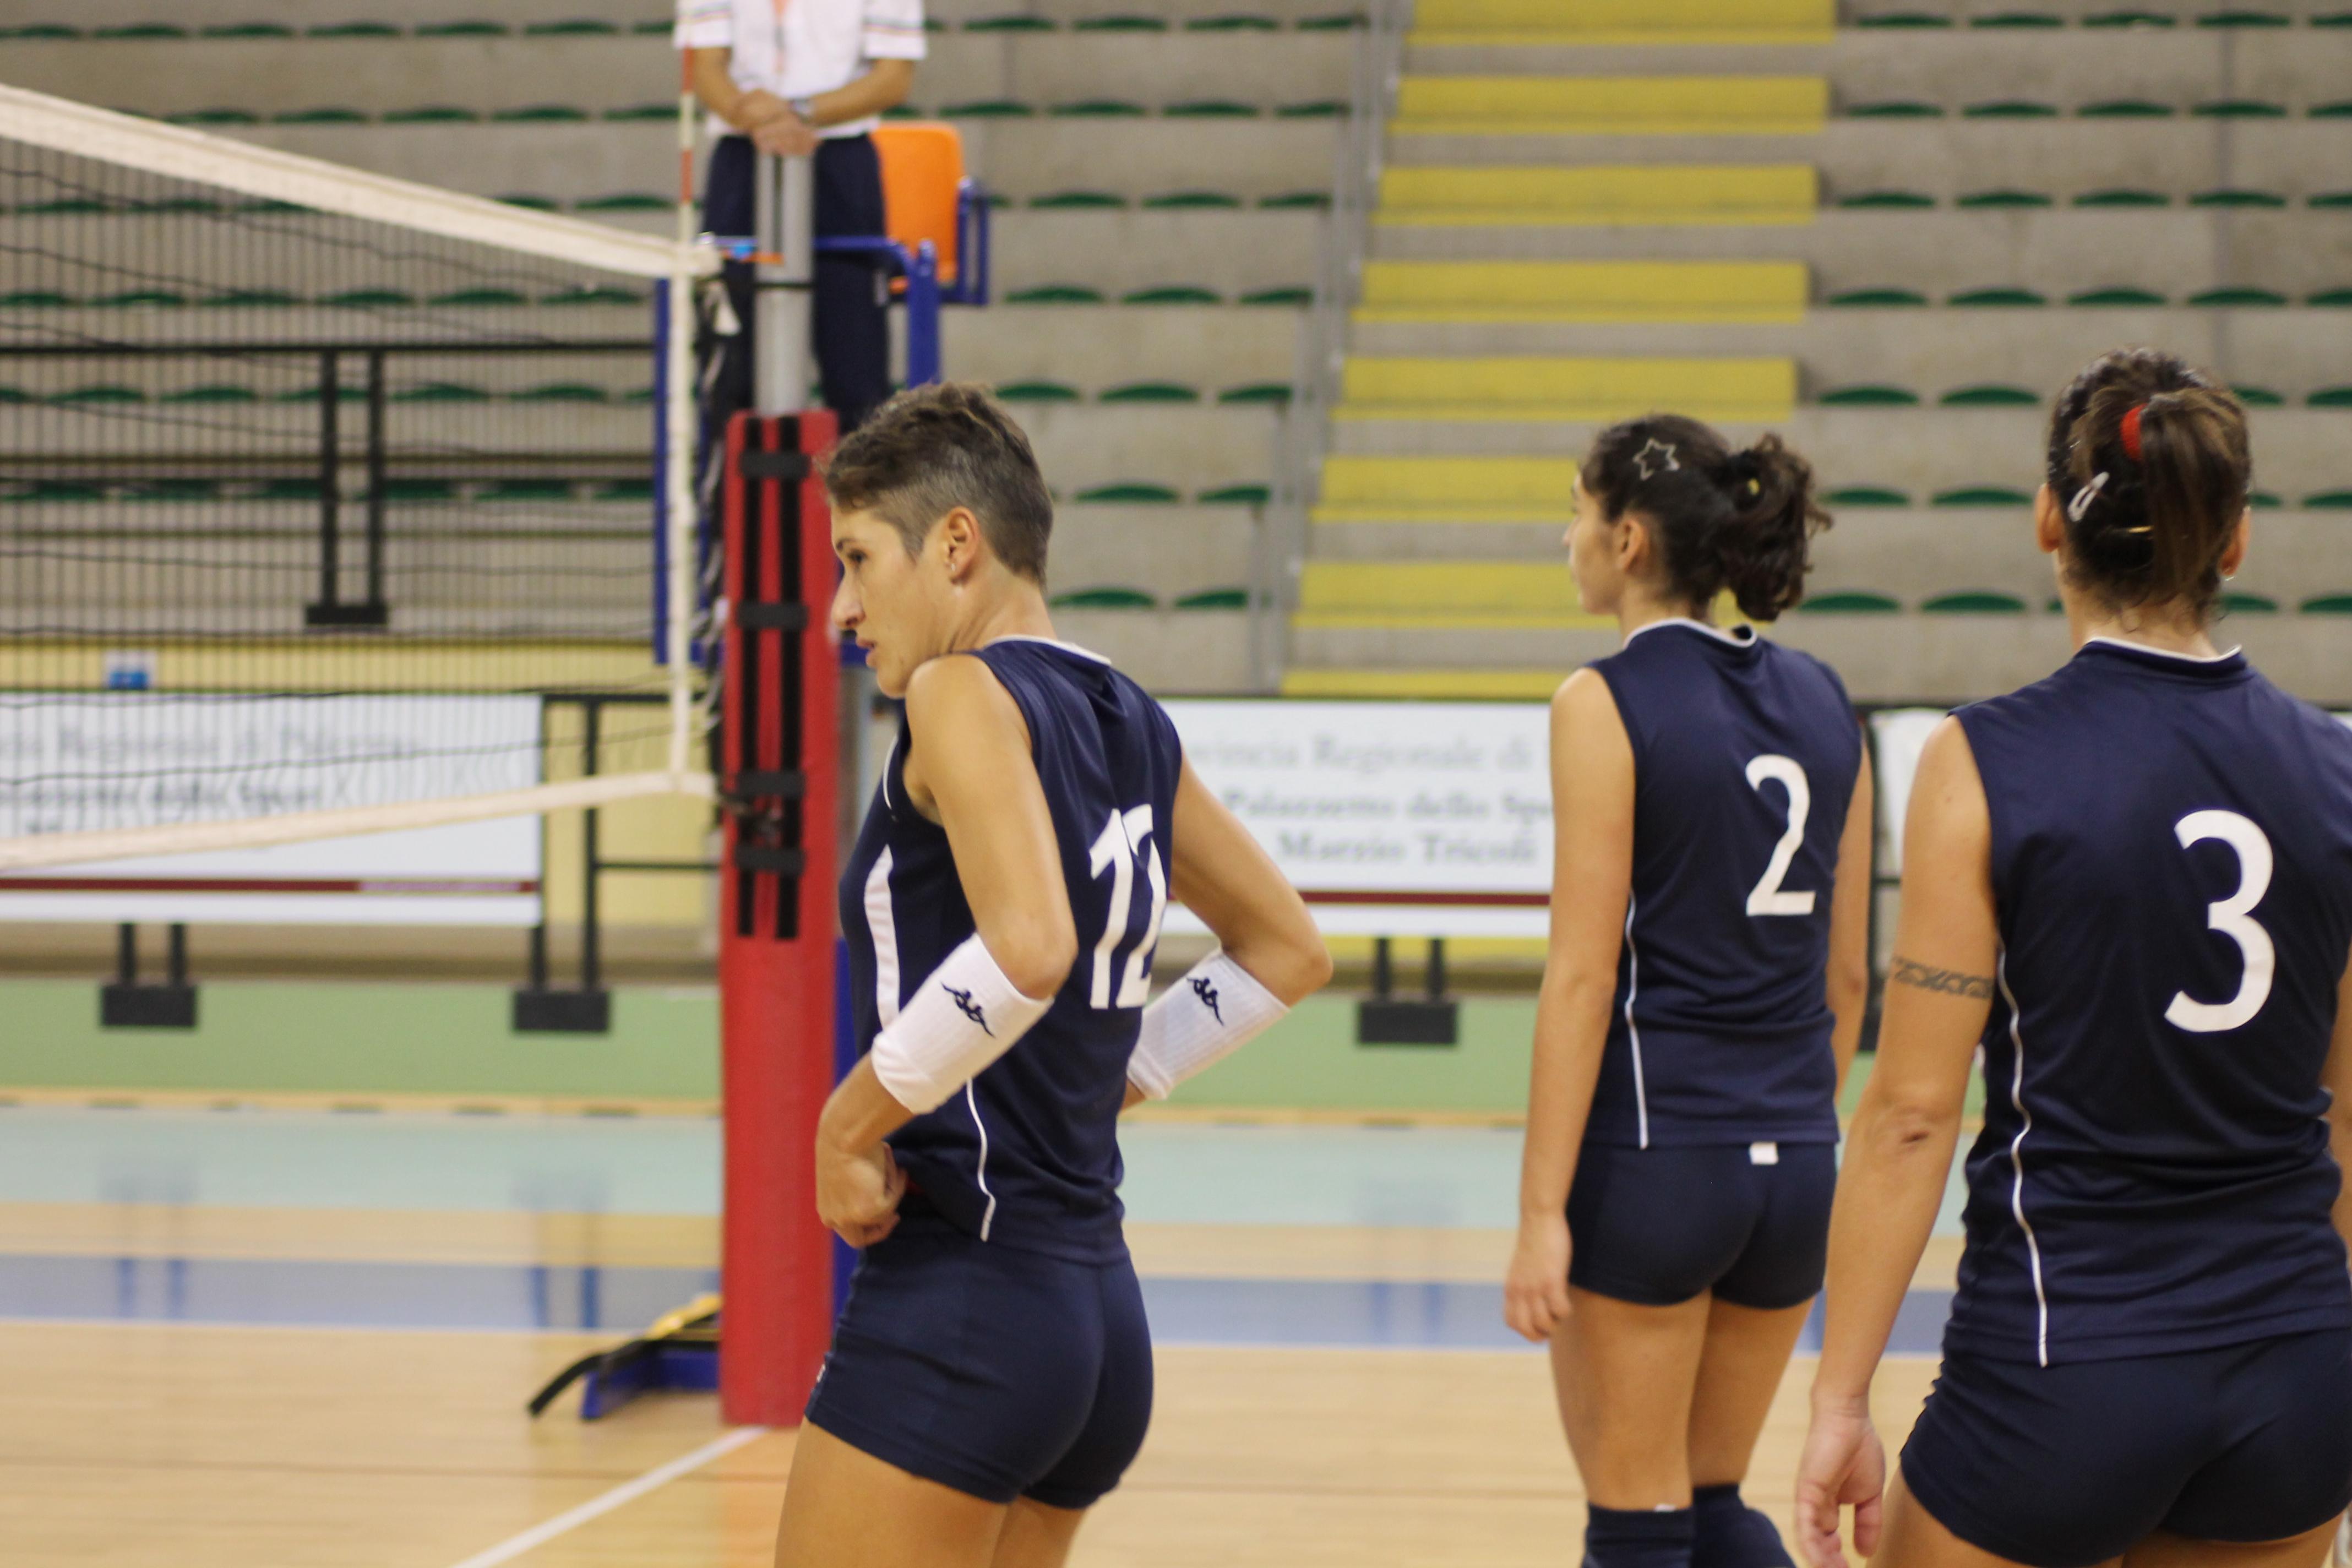 Costaverde Cefalù Volley: oggi la grande sfida contro l'Akragas